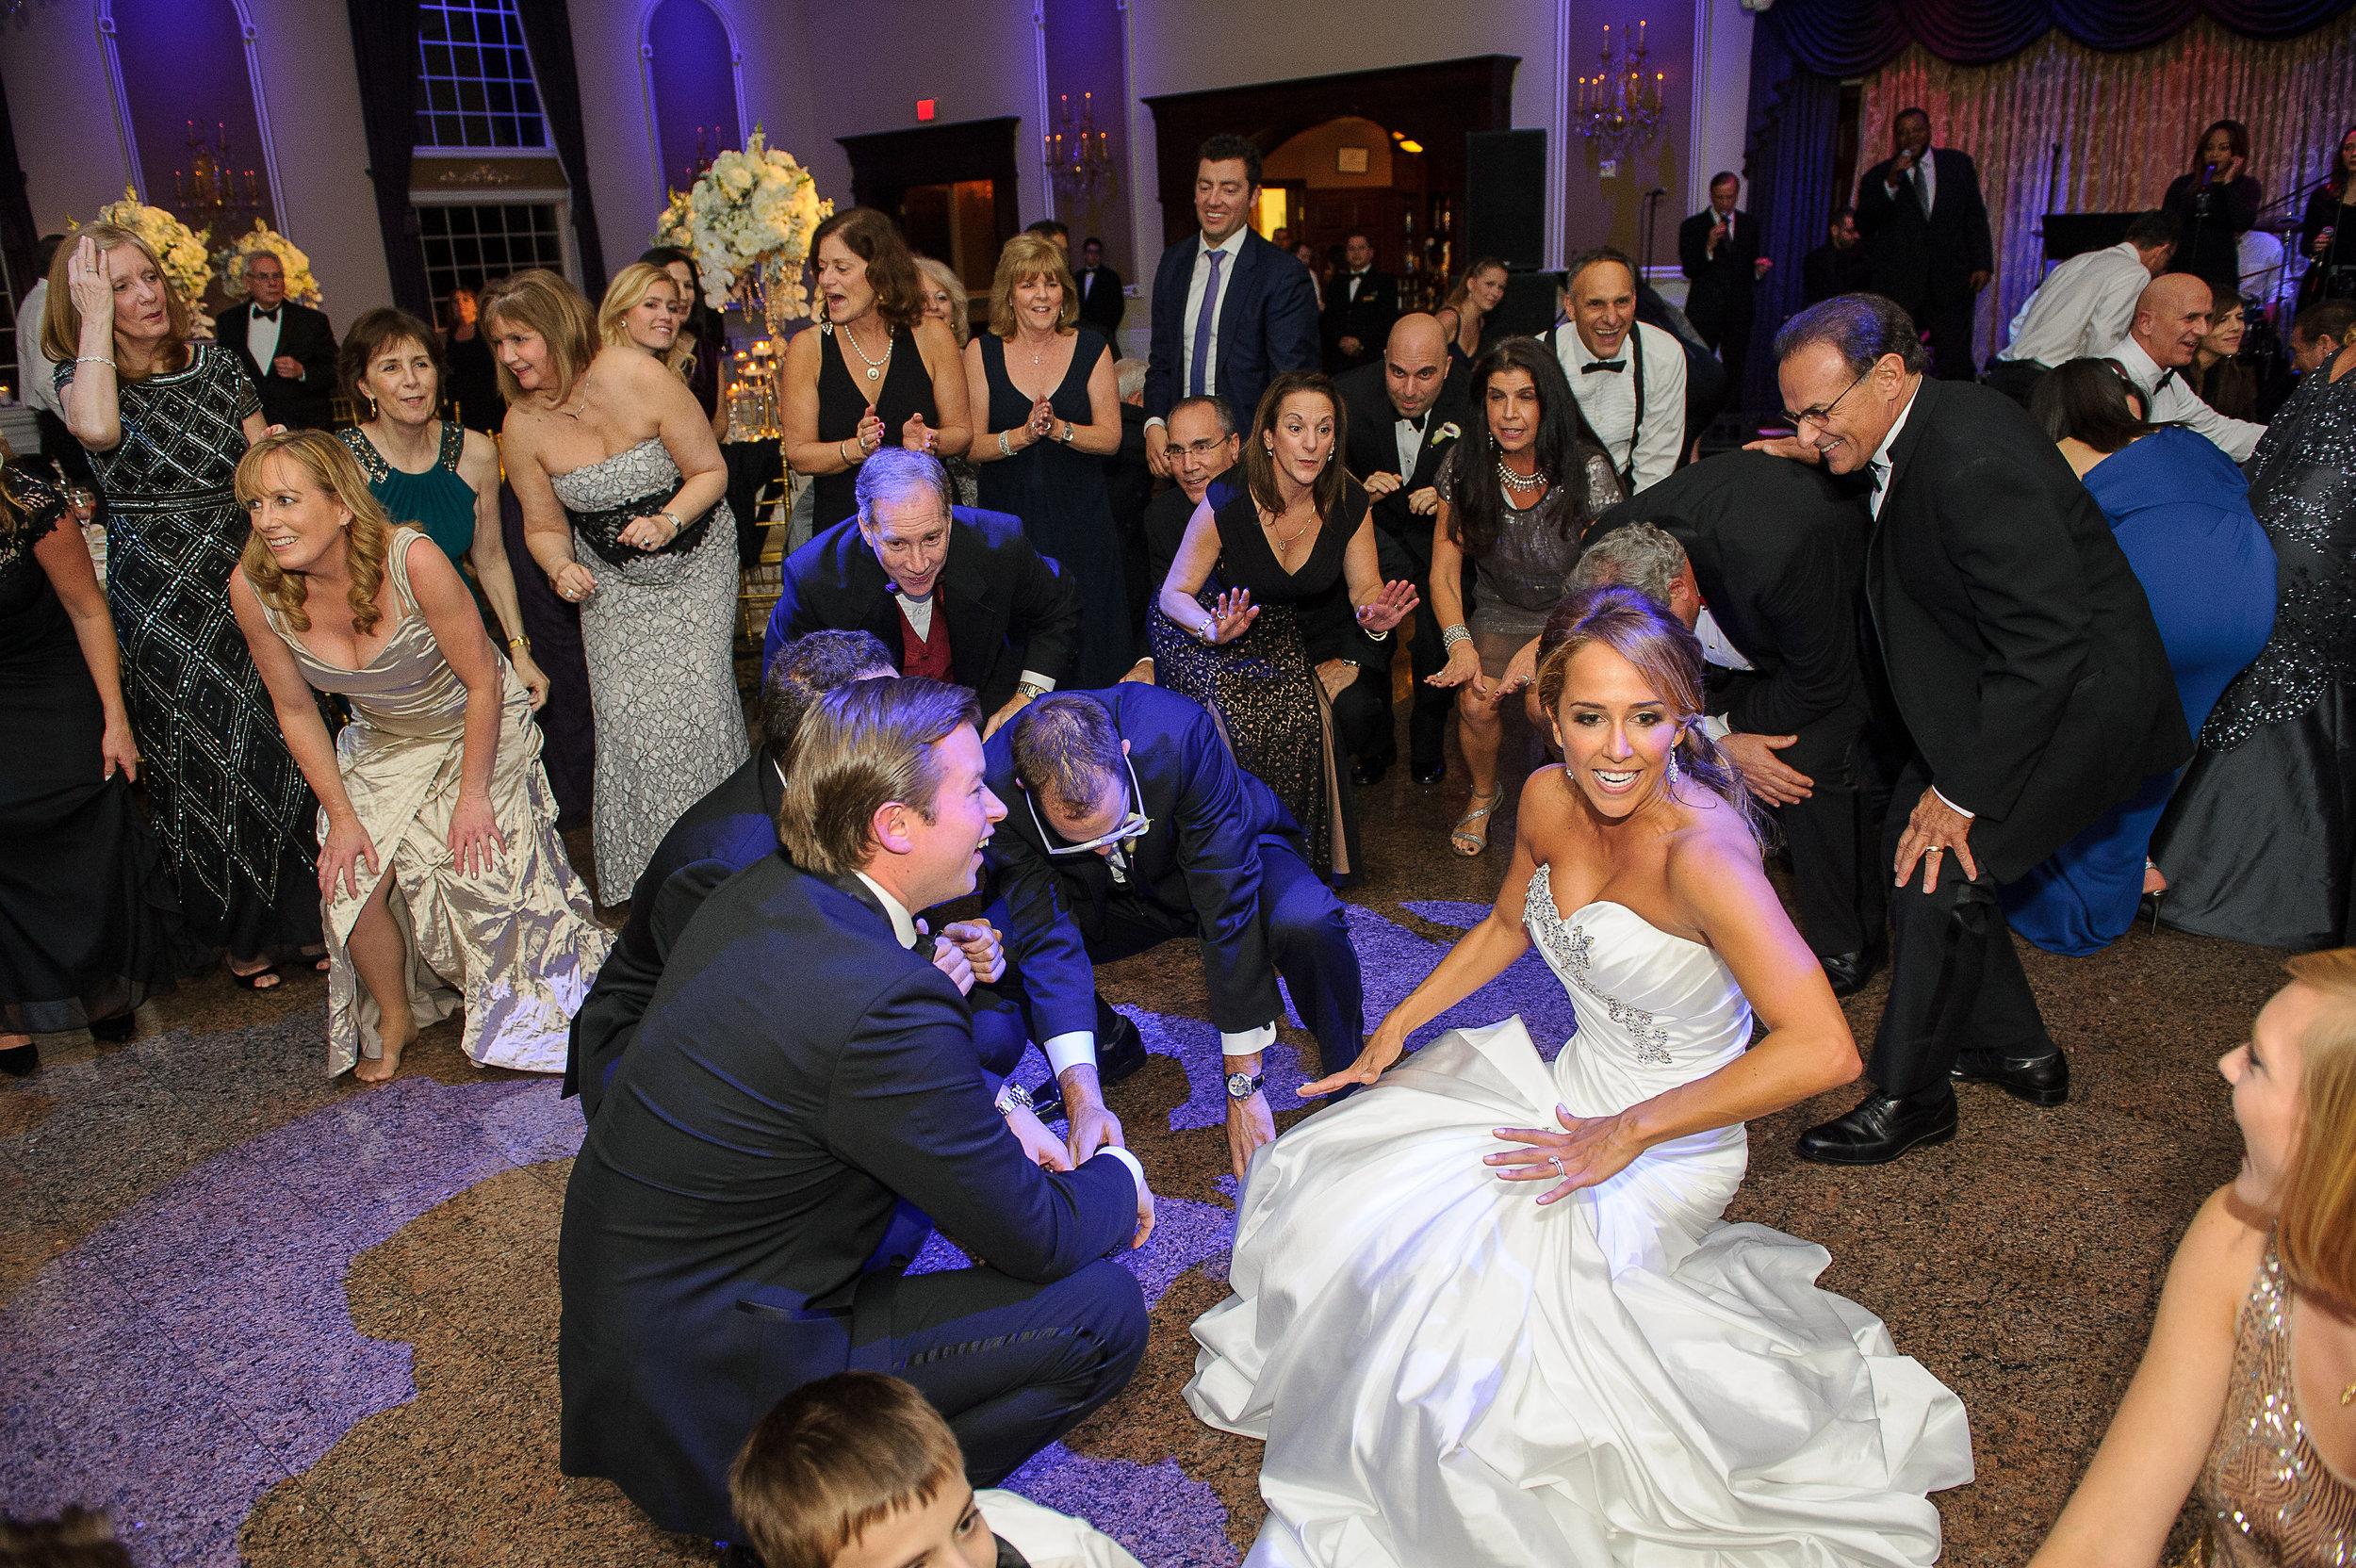 Ceci_New_York_Custom_Invitation_ New_Jersey_Wedding_Luxury_Personalized_Ceci_Style_Bride_Foil_Stamping121.JPG